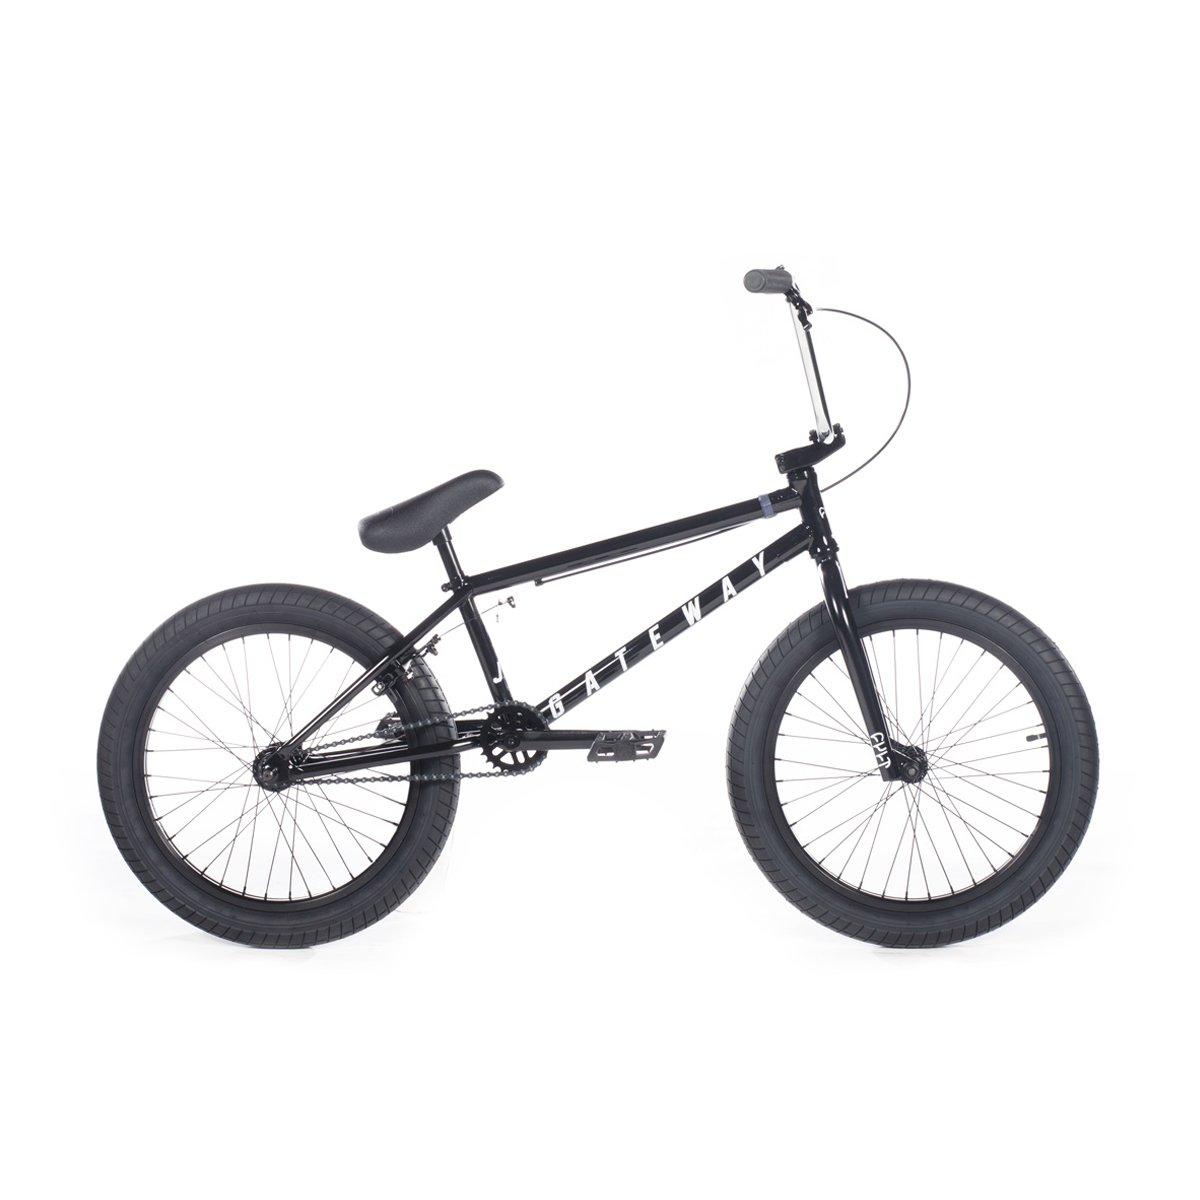 "Rower BMX Cult Gateway JR-A 20"" Black"